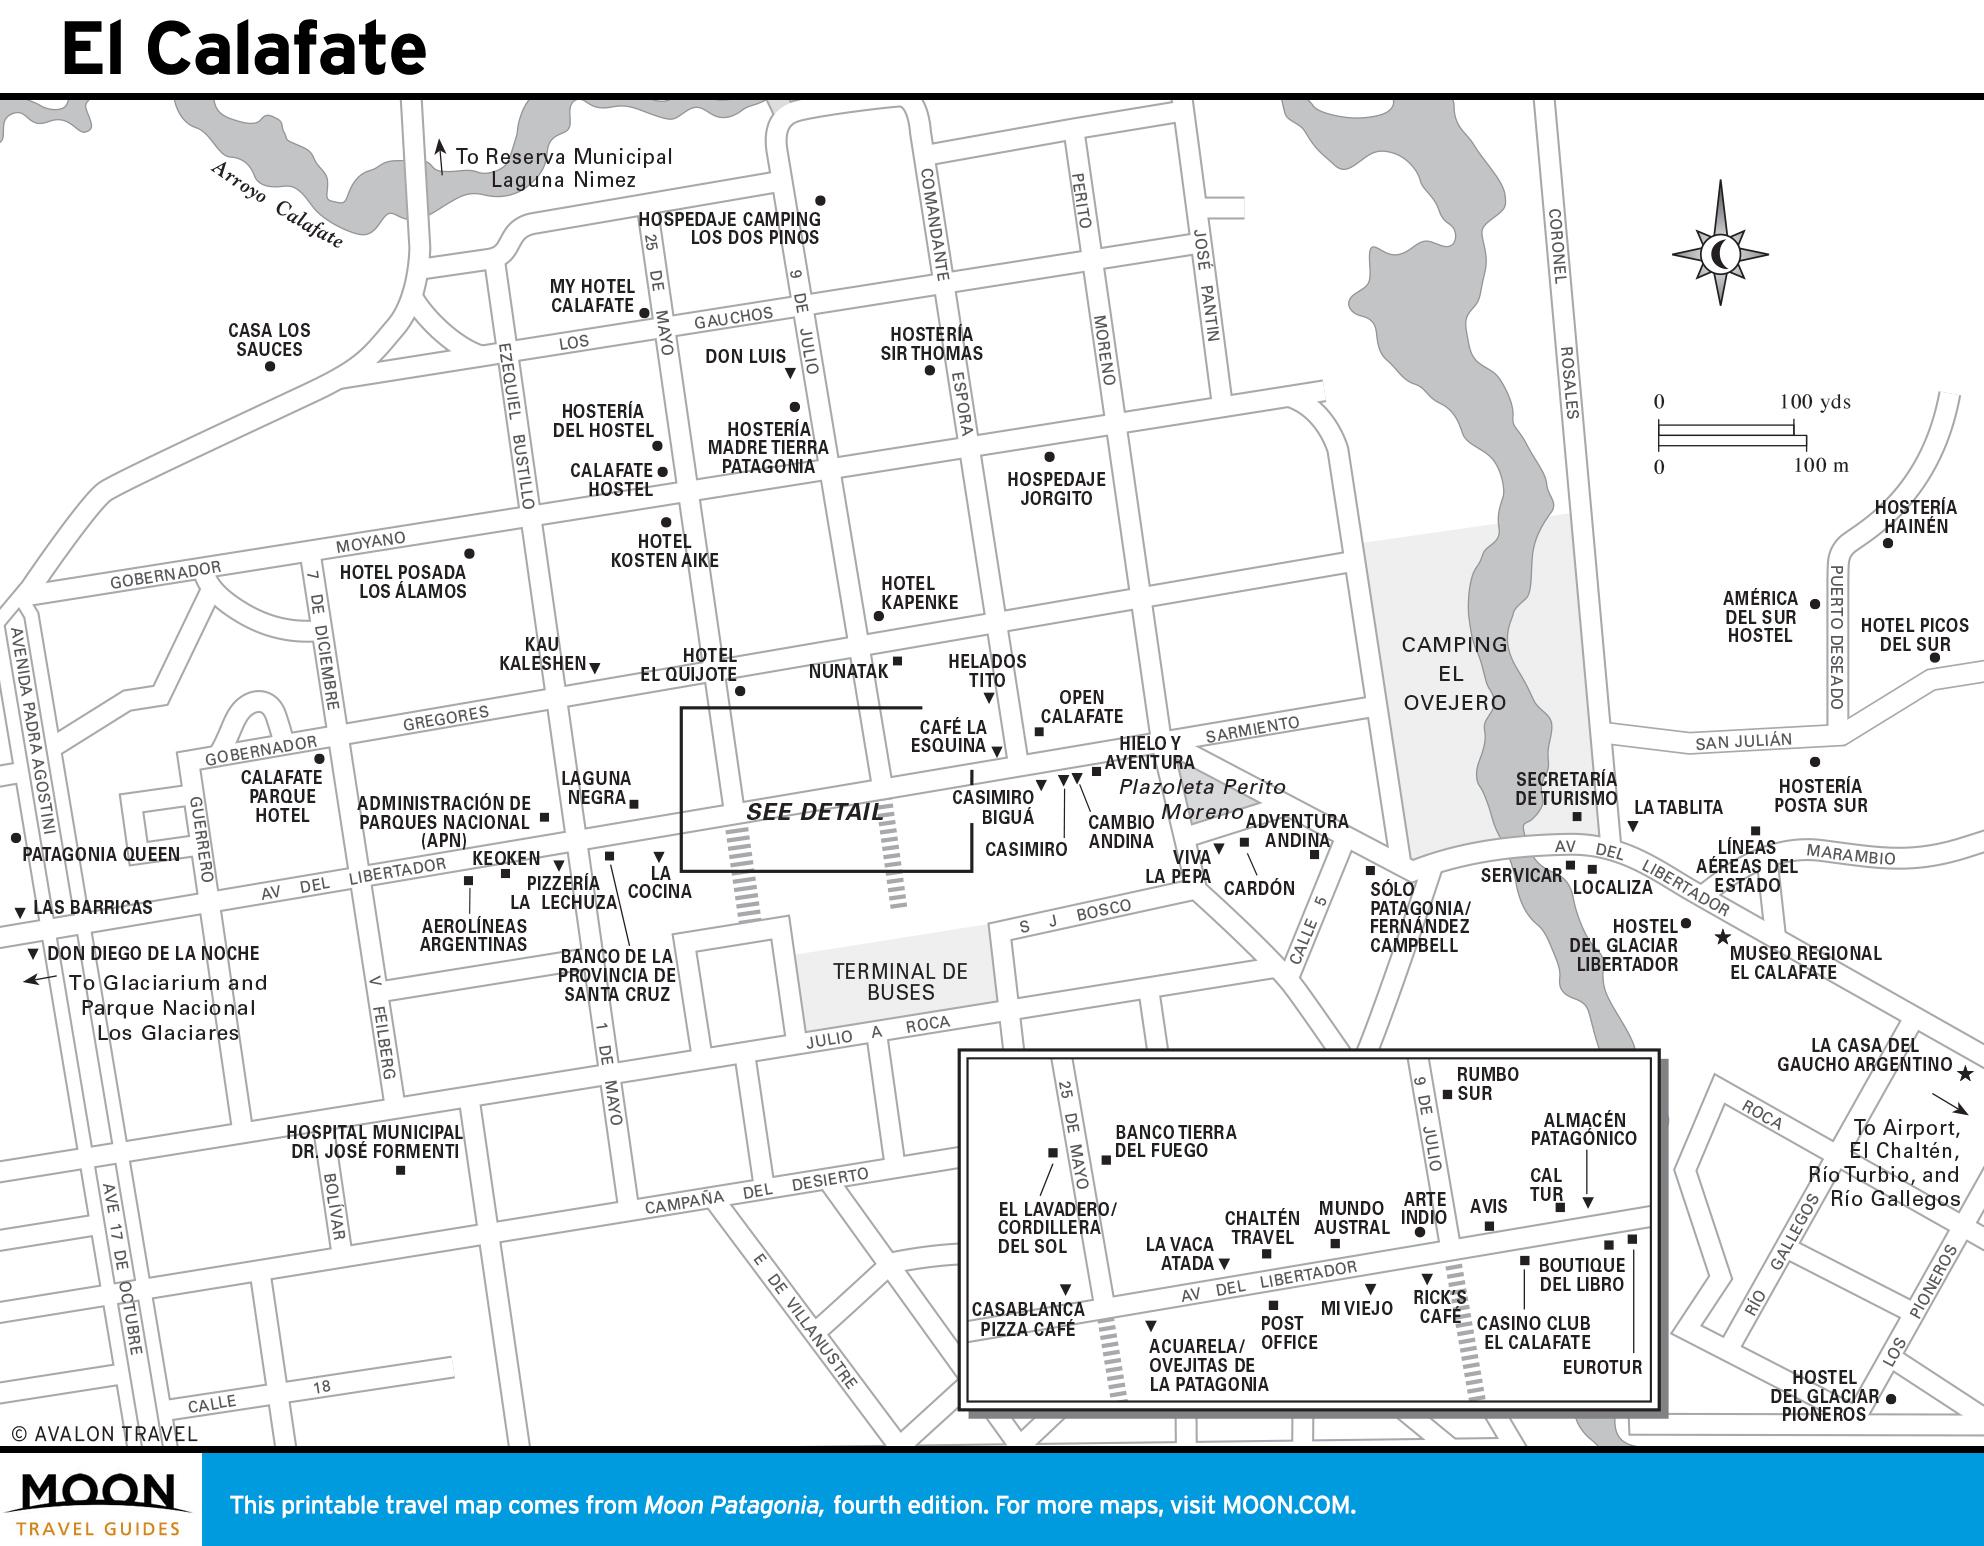 Maps - Patagonia 4e - El Calafate, Argentina